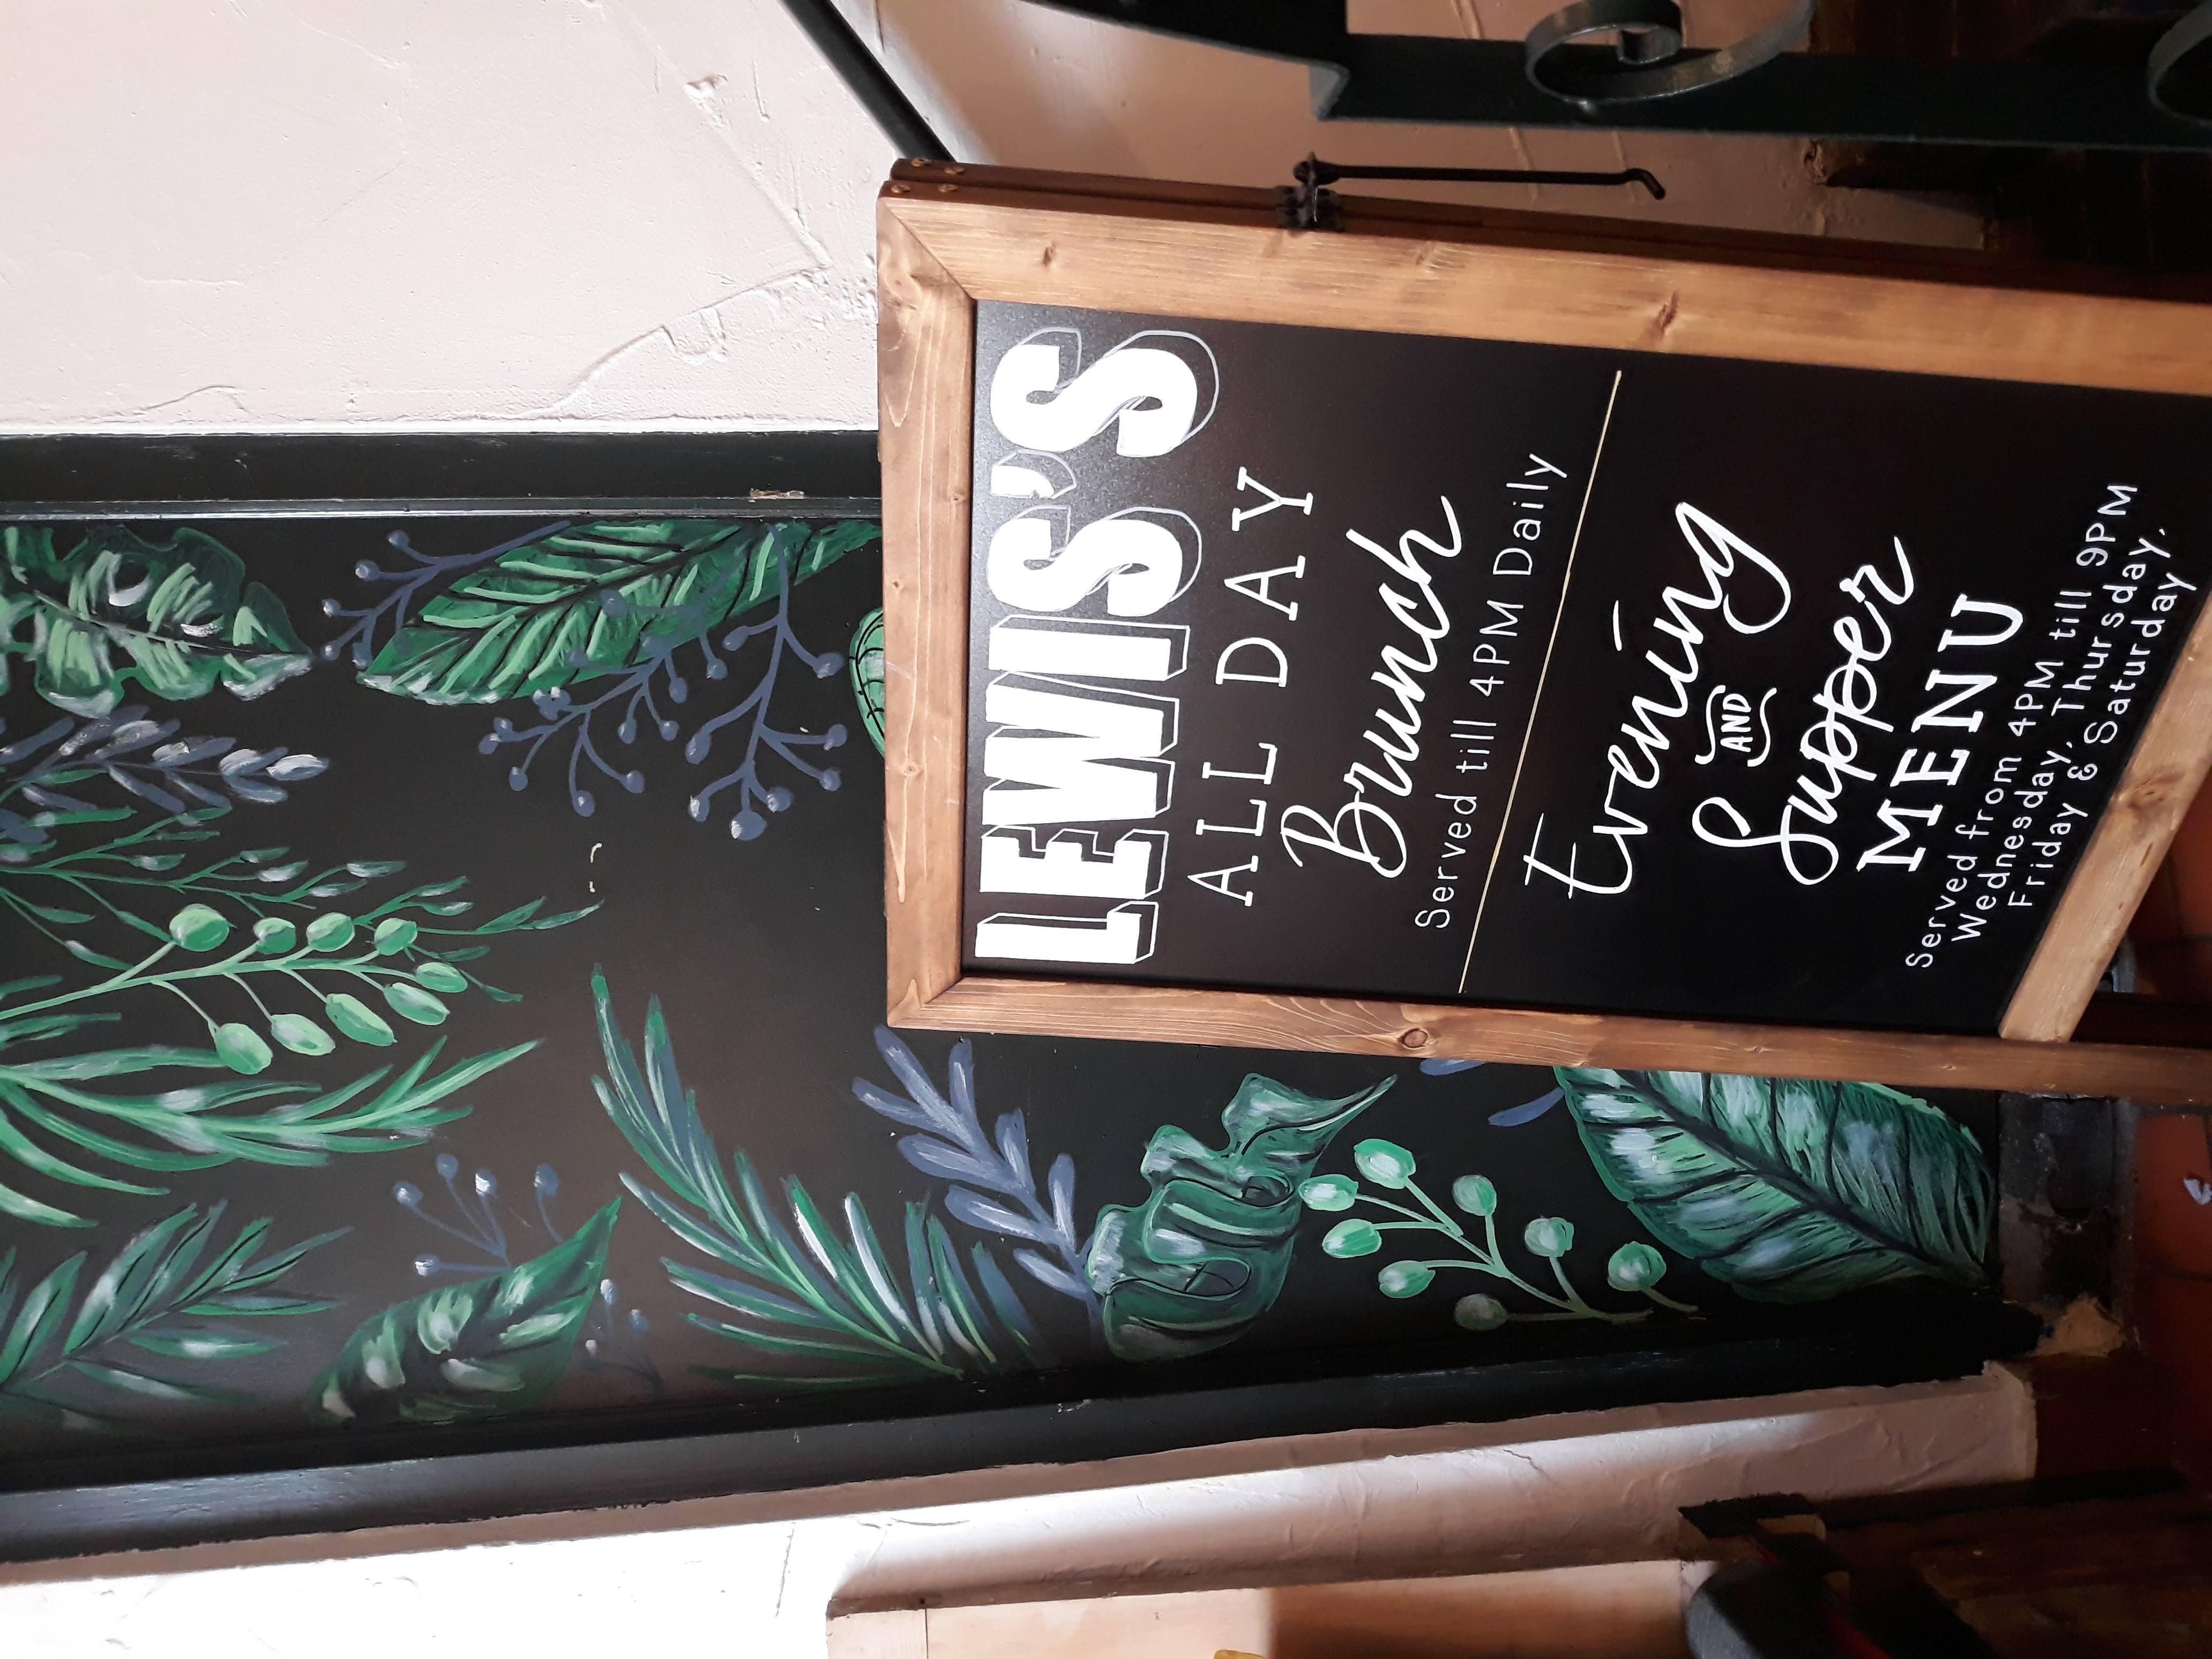 Lewis's Moseley